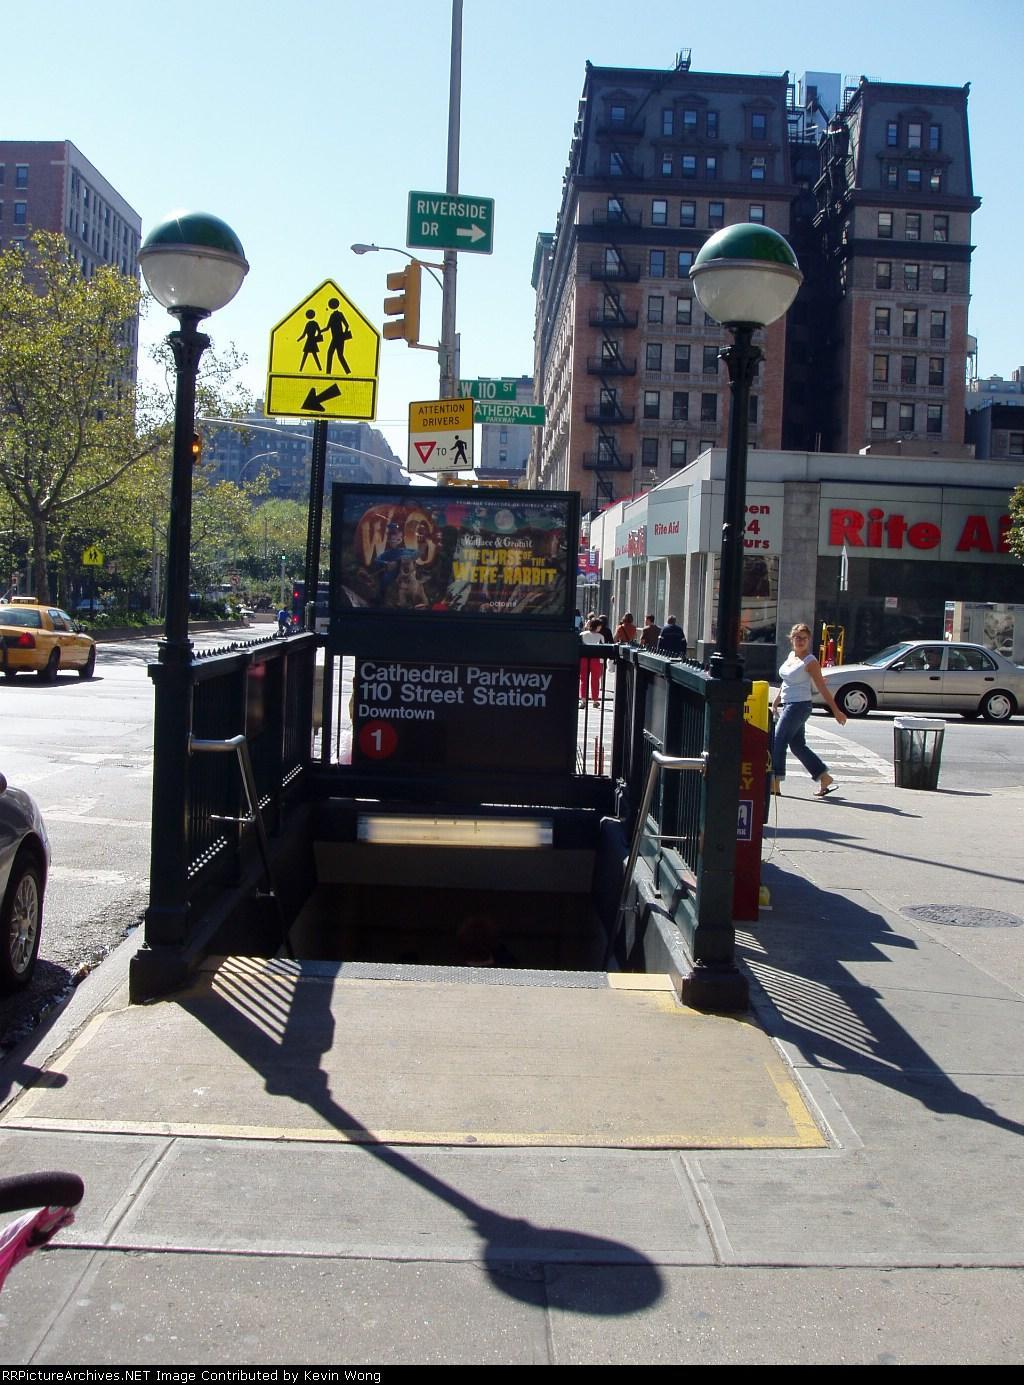 (216k, 1024x1385)<br><b>Country:</b> United States<br><b>City:</b> New York<br><b>System:</b> New York City Transit<br><b>Line:</b> IRT West Side Line<br><b>Location:</b> 110th Street <br><b>Photo by:</b> Kevin Wong<br><b>Date:</b> 10/2/2005<br><b>Notes:</b> Station entrance.<br><b>Viewed (this week/total):</b> 0 / 5818